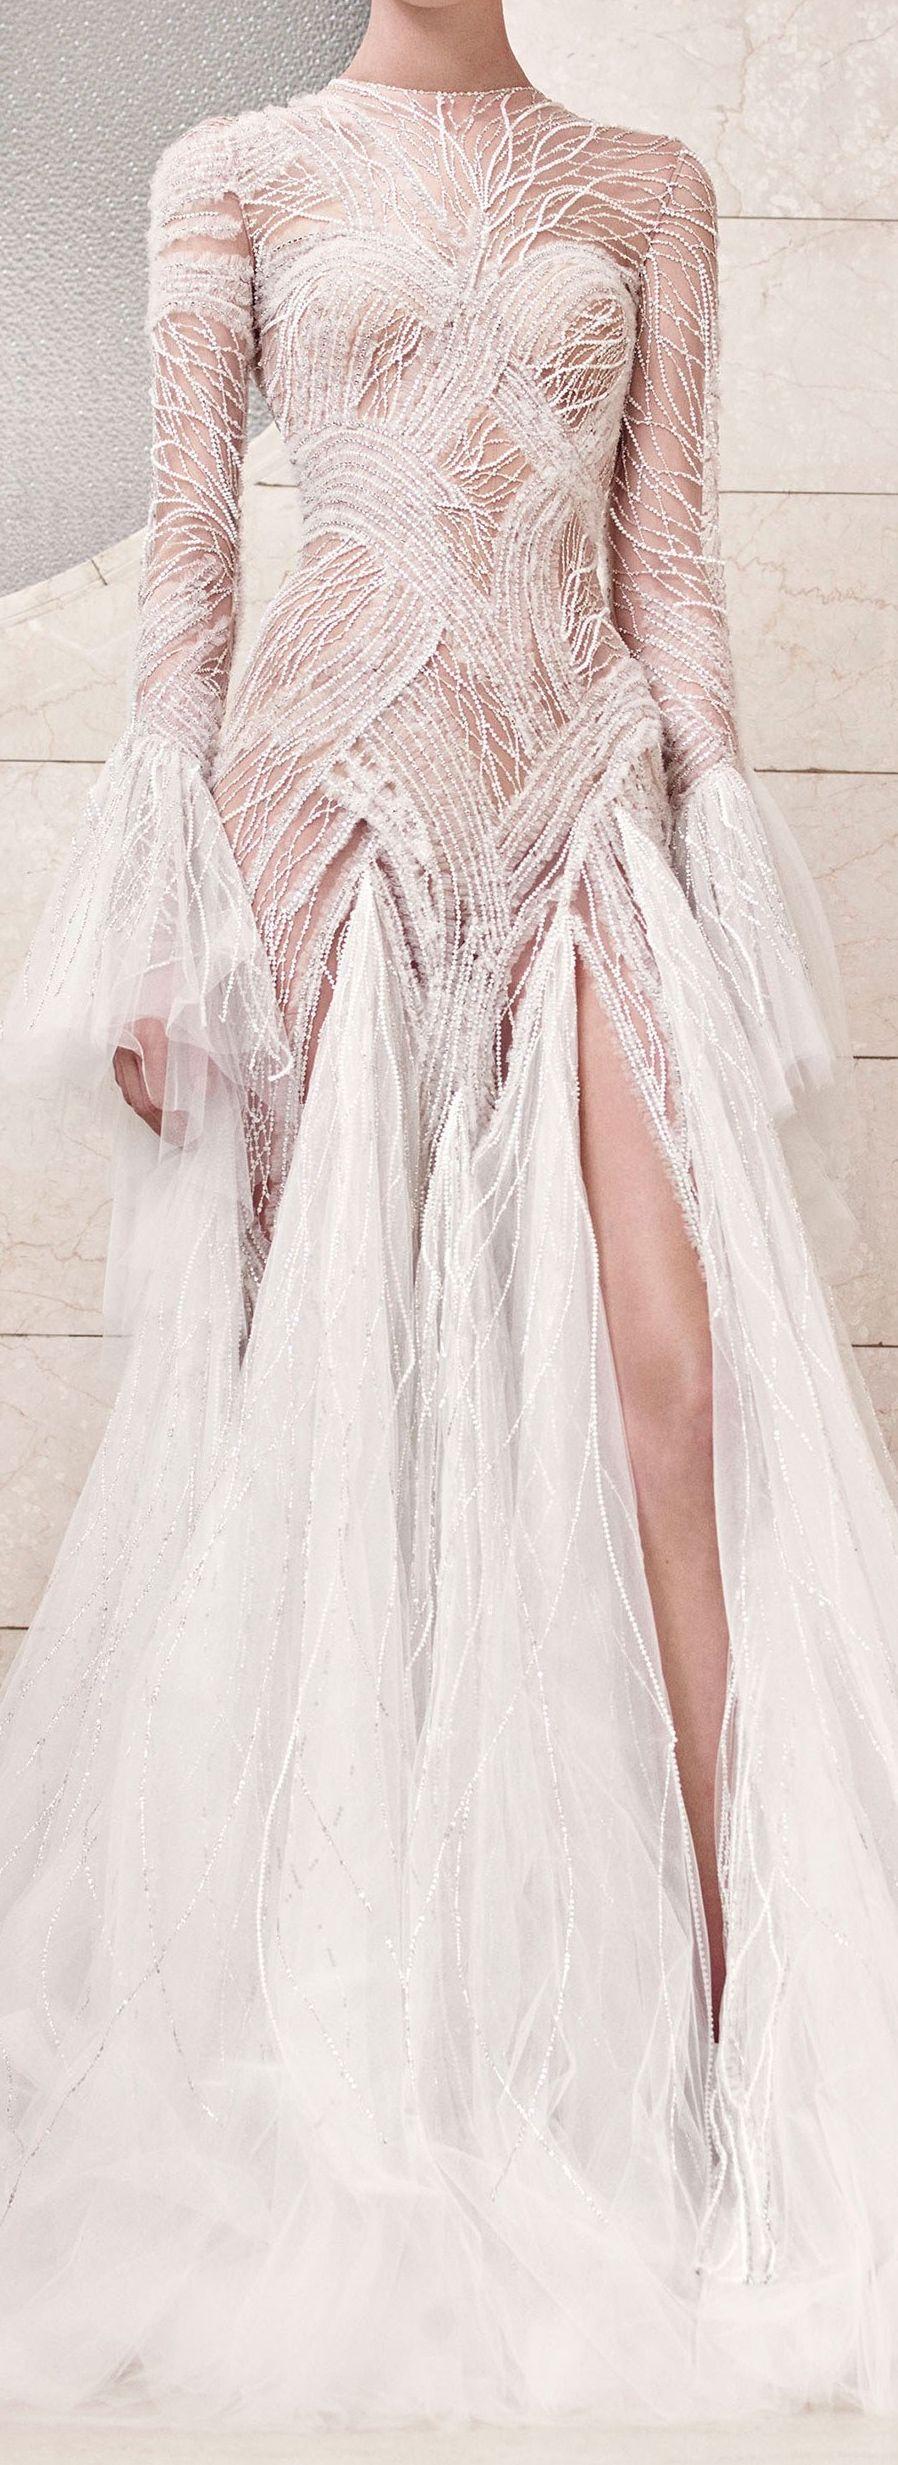 Versace wedding dress  Atelier Versace Bridal HC  FW   Wedding Dress